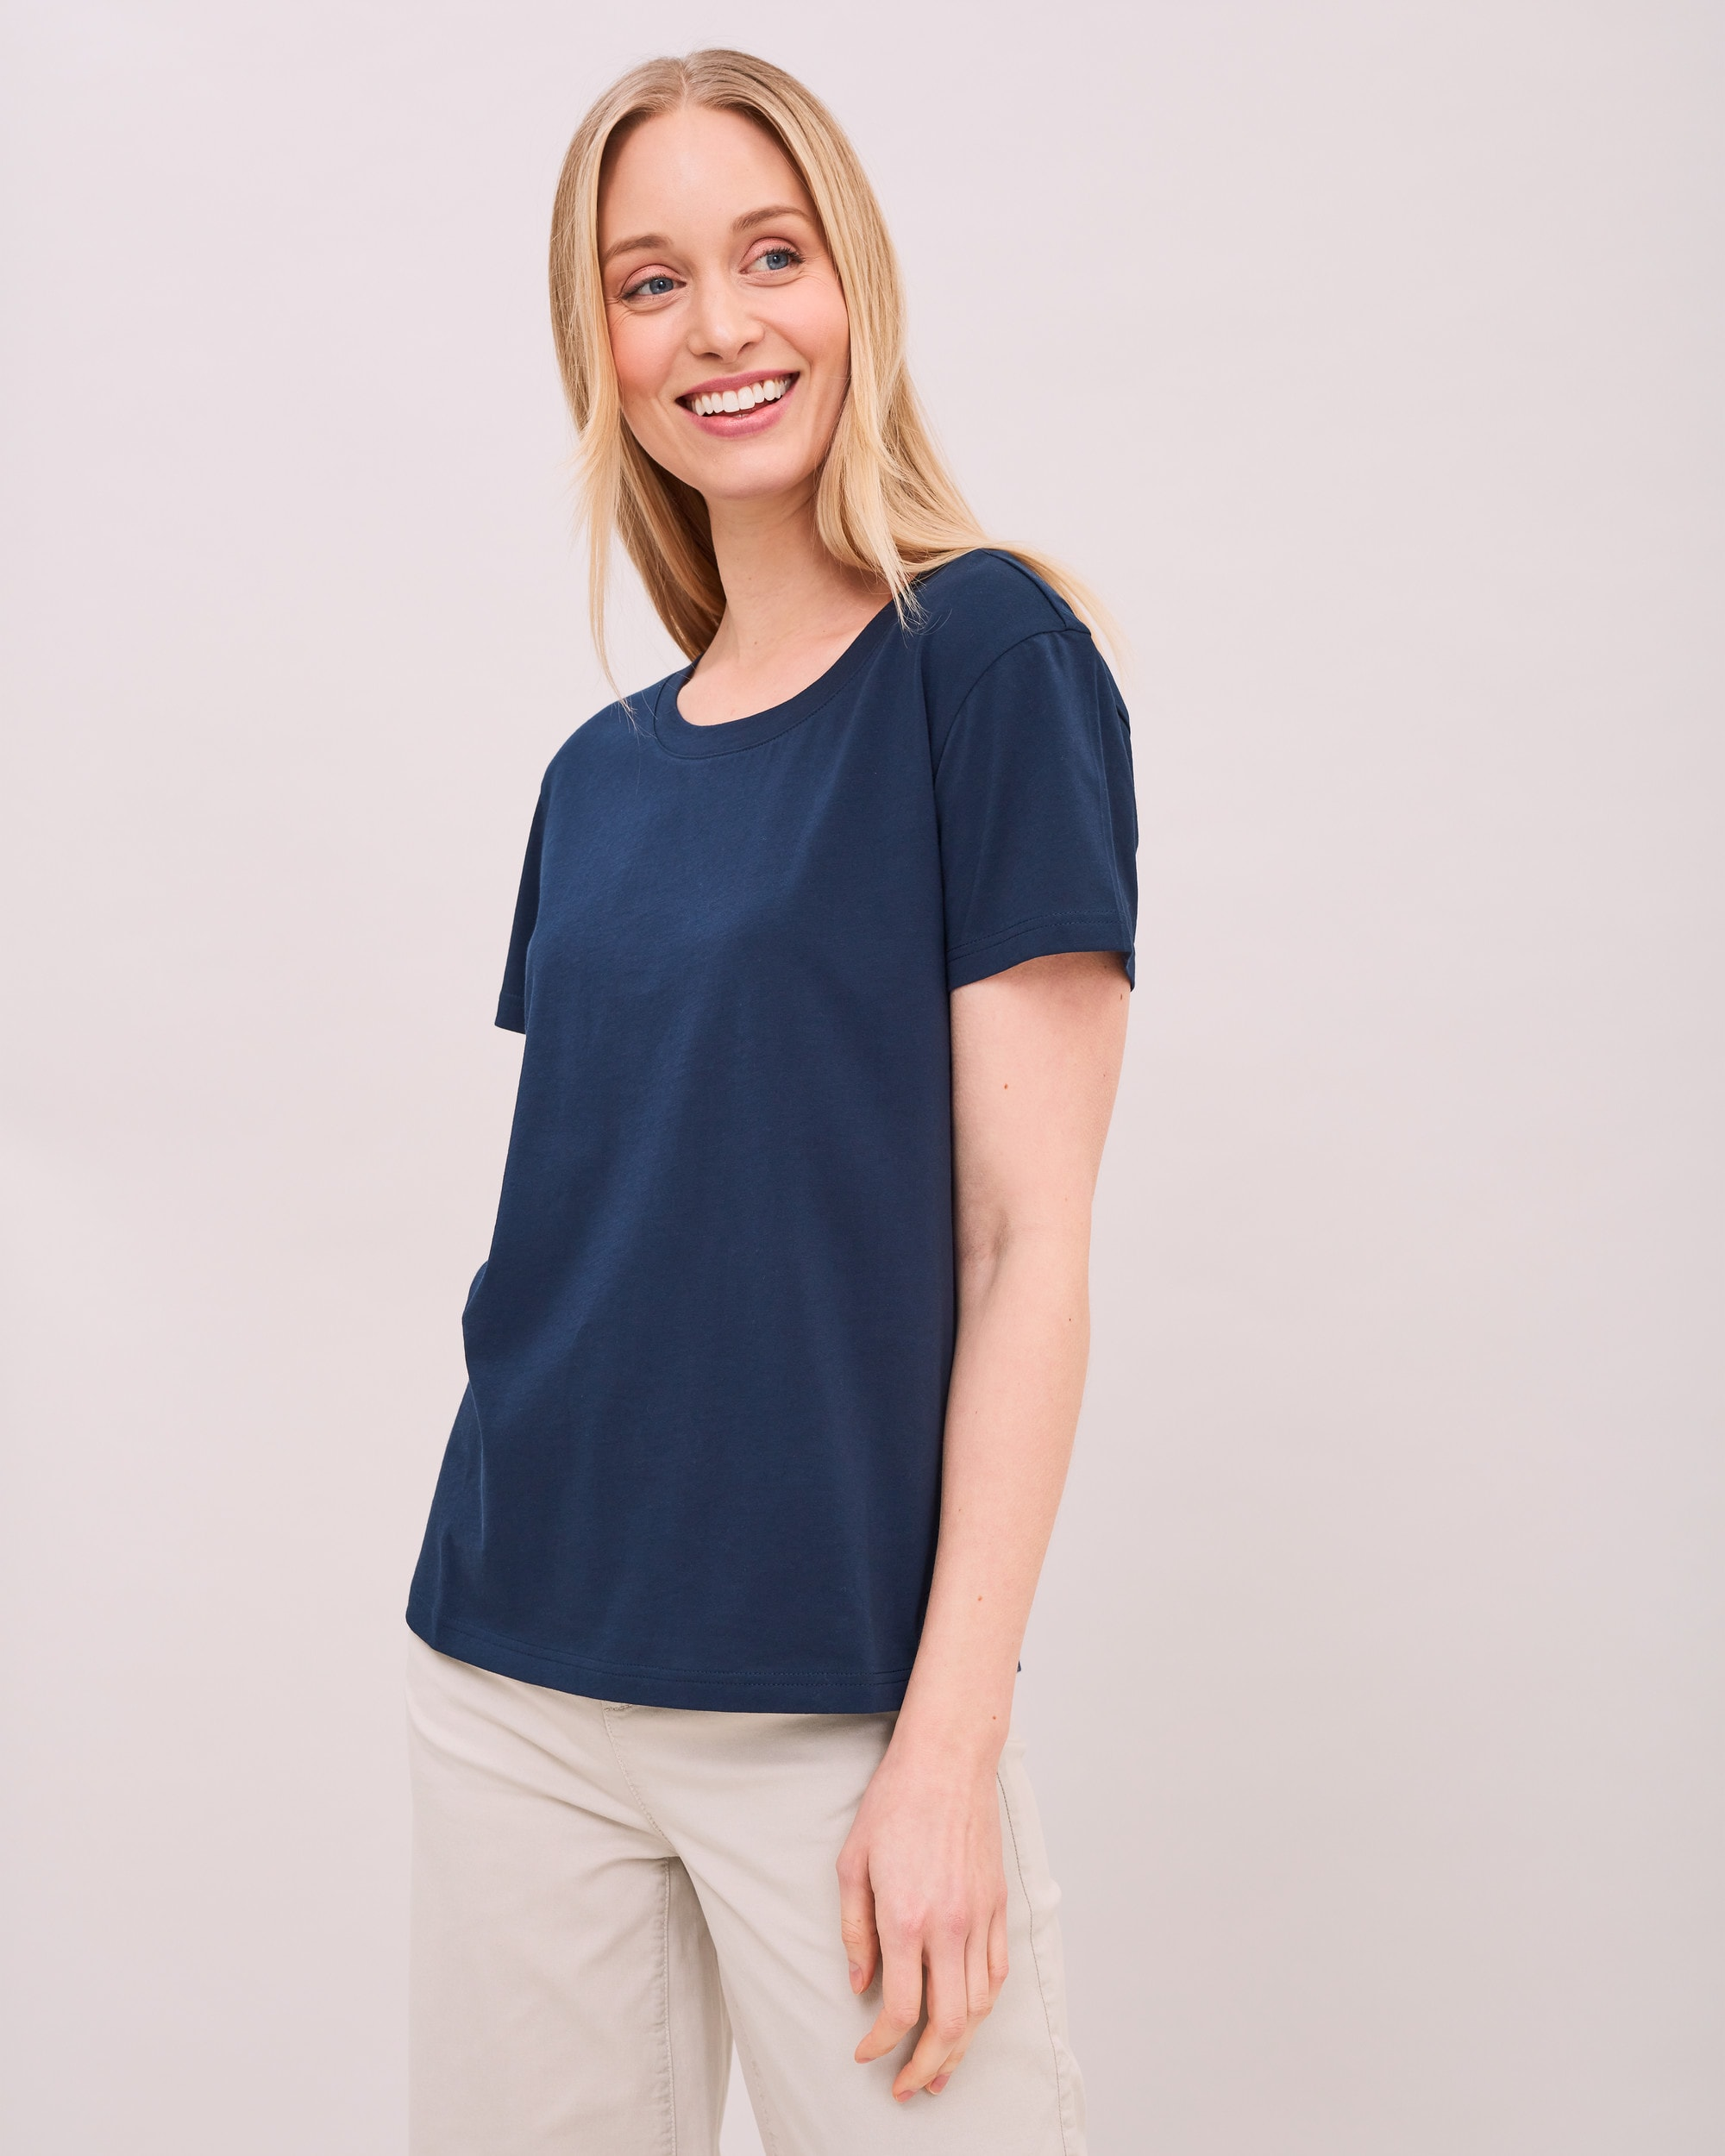 T-shirt Siri i bomull - Marinblå